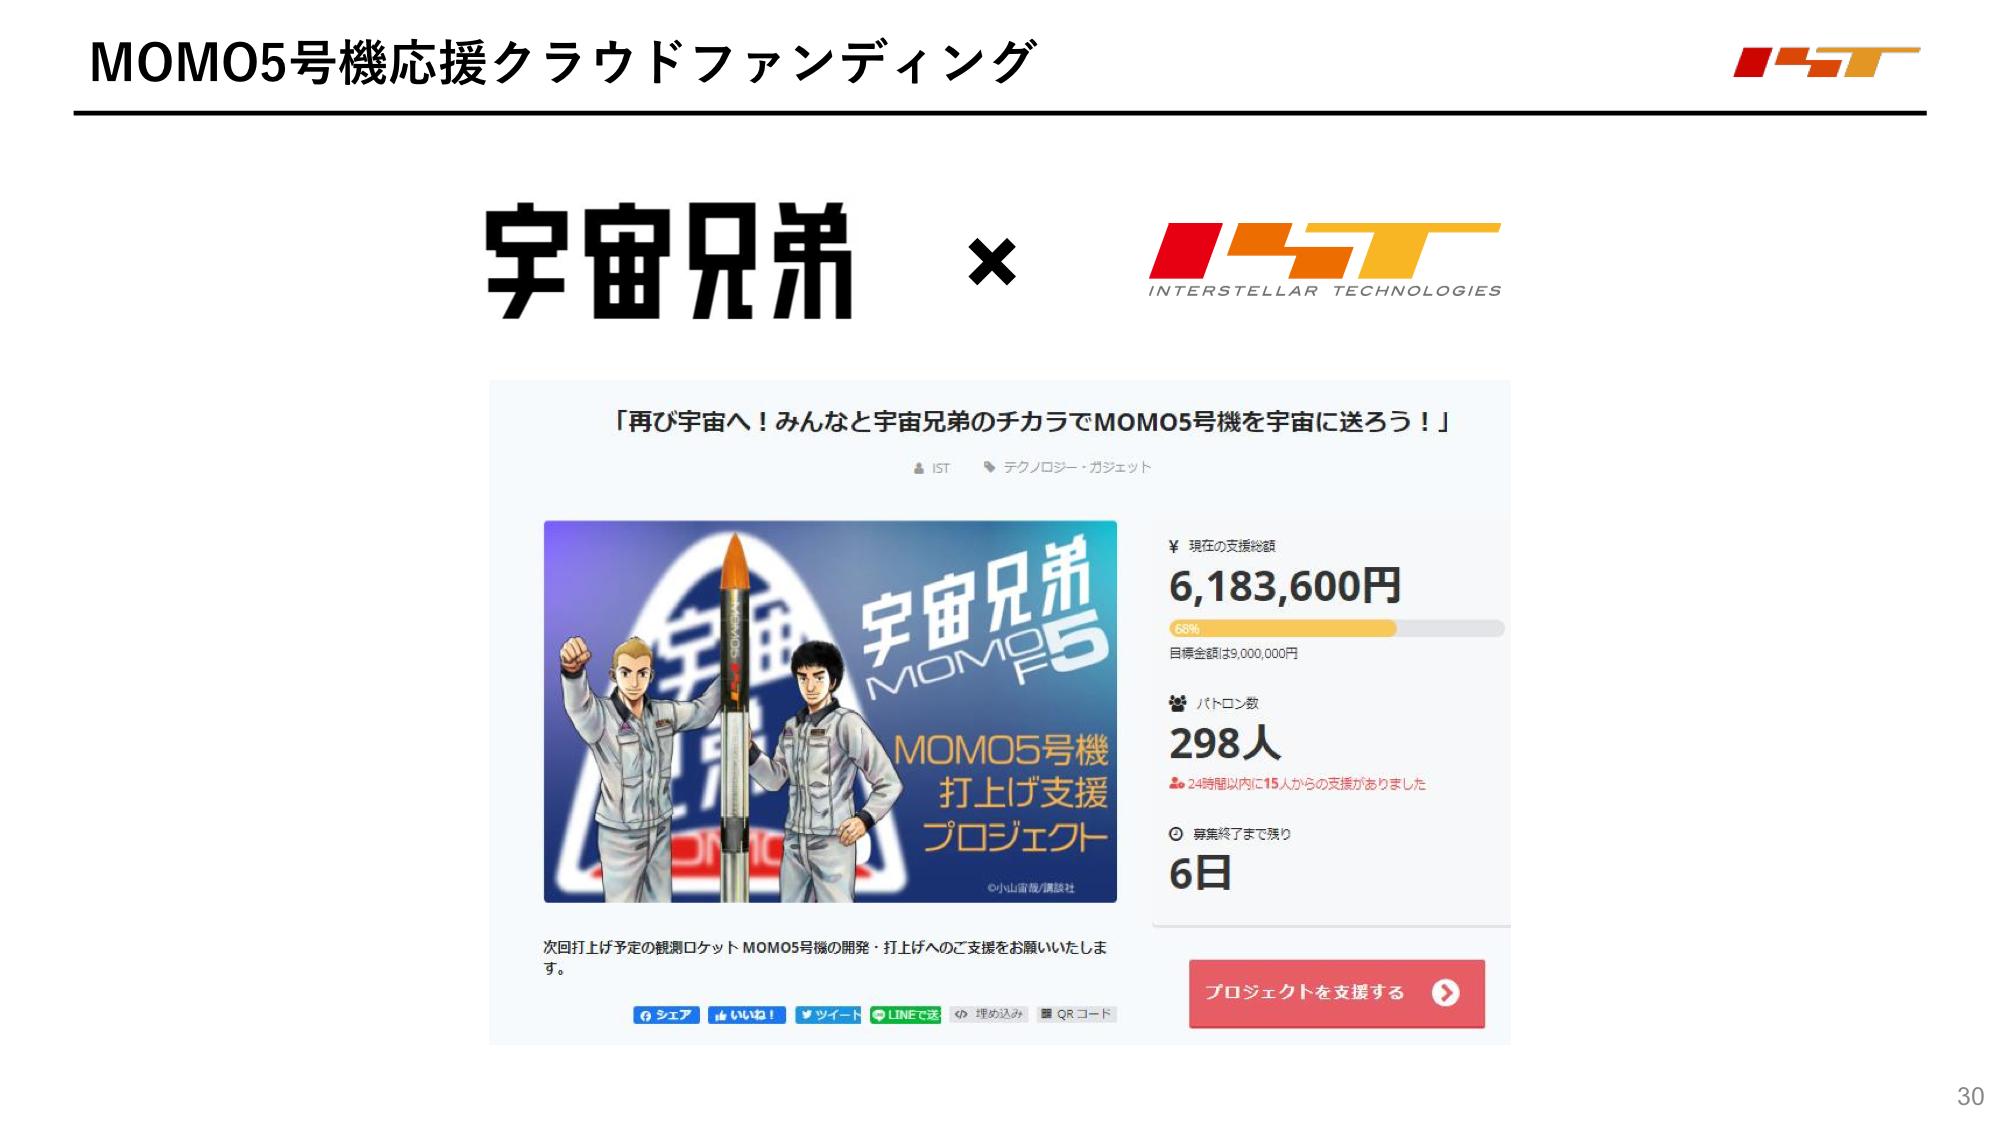 f:id:Imamura:20191126135310p:plain